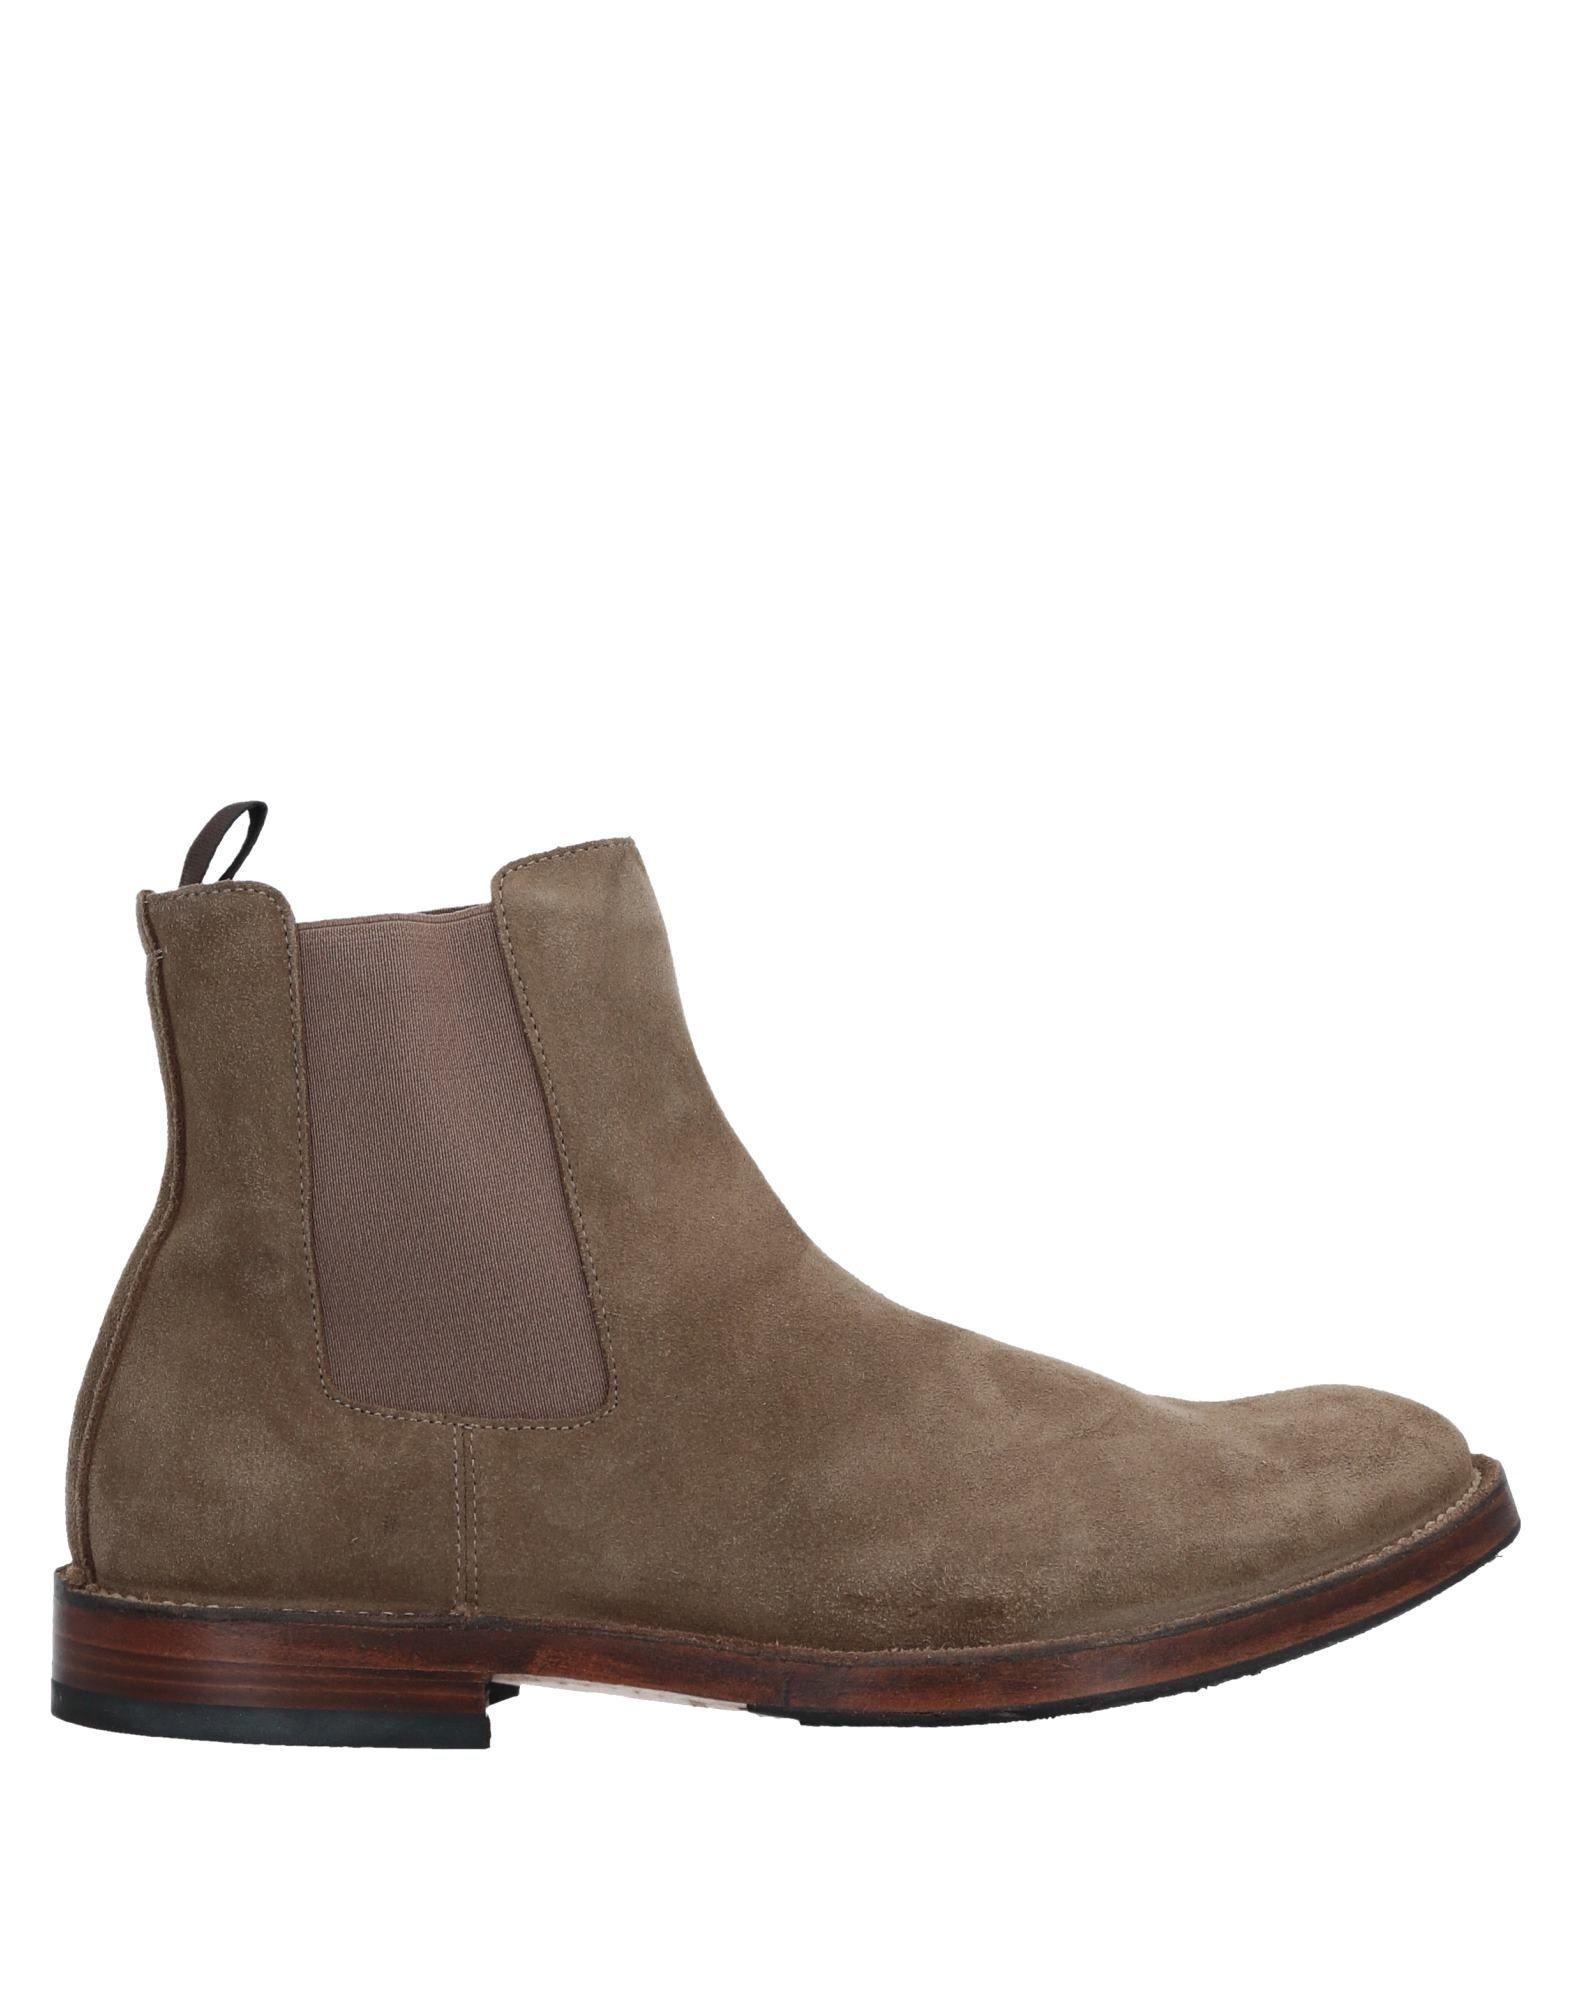 Officine Creative Italia Stiefelette Herren  11513287UD Neue Schuhe